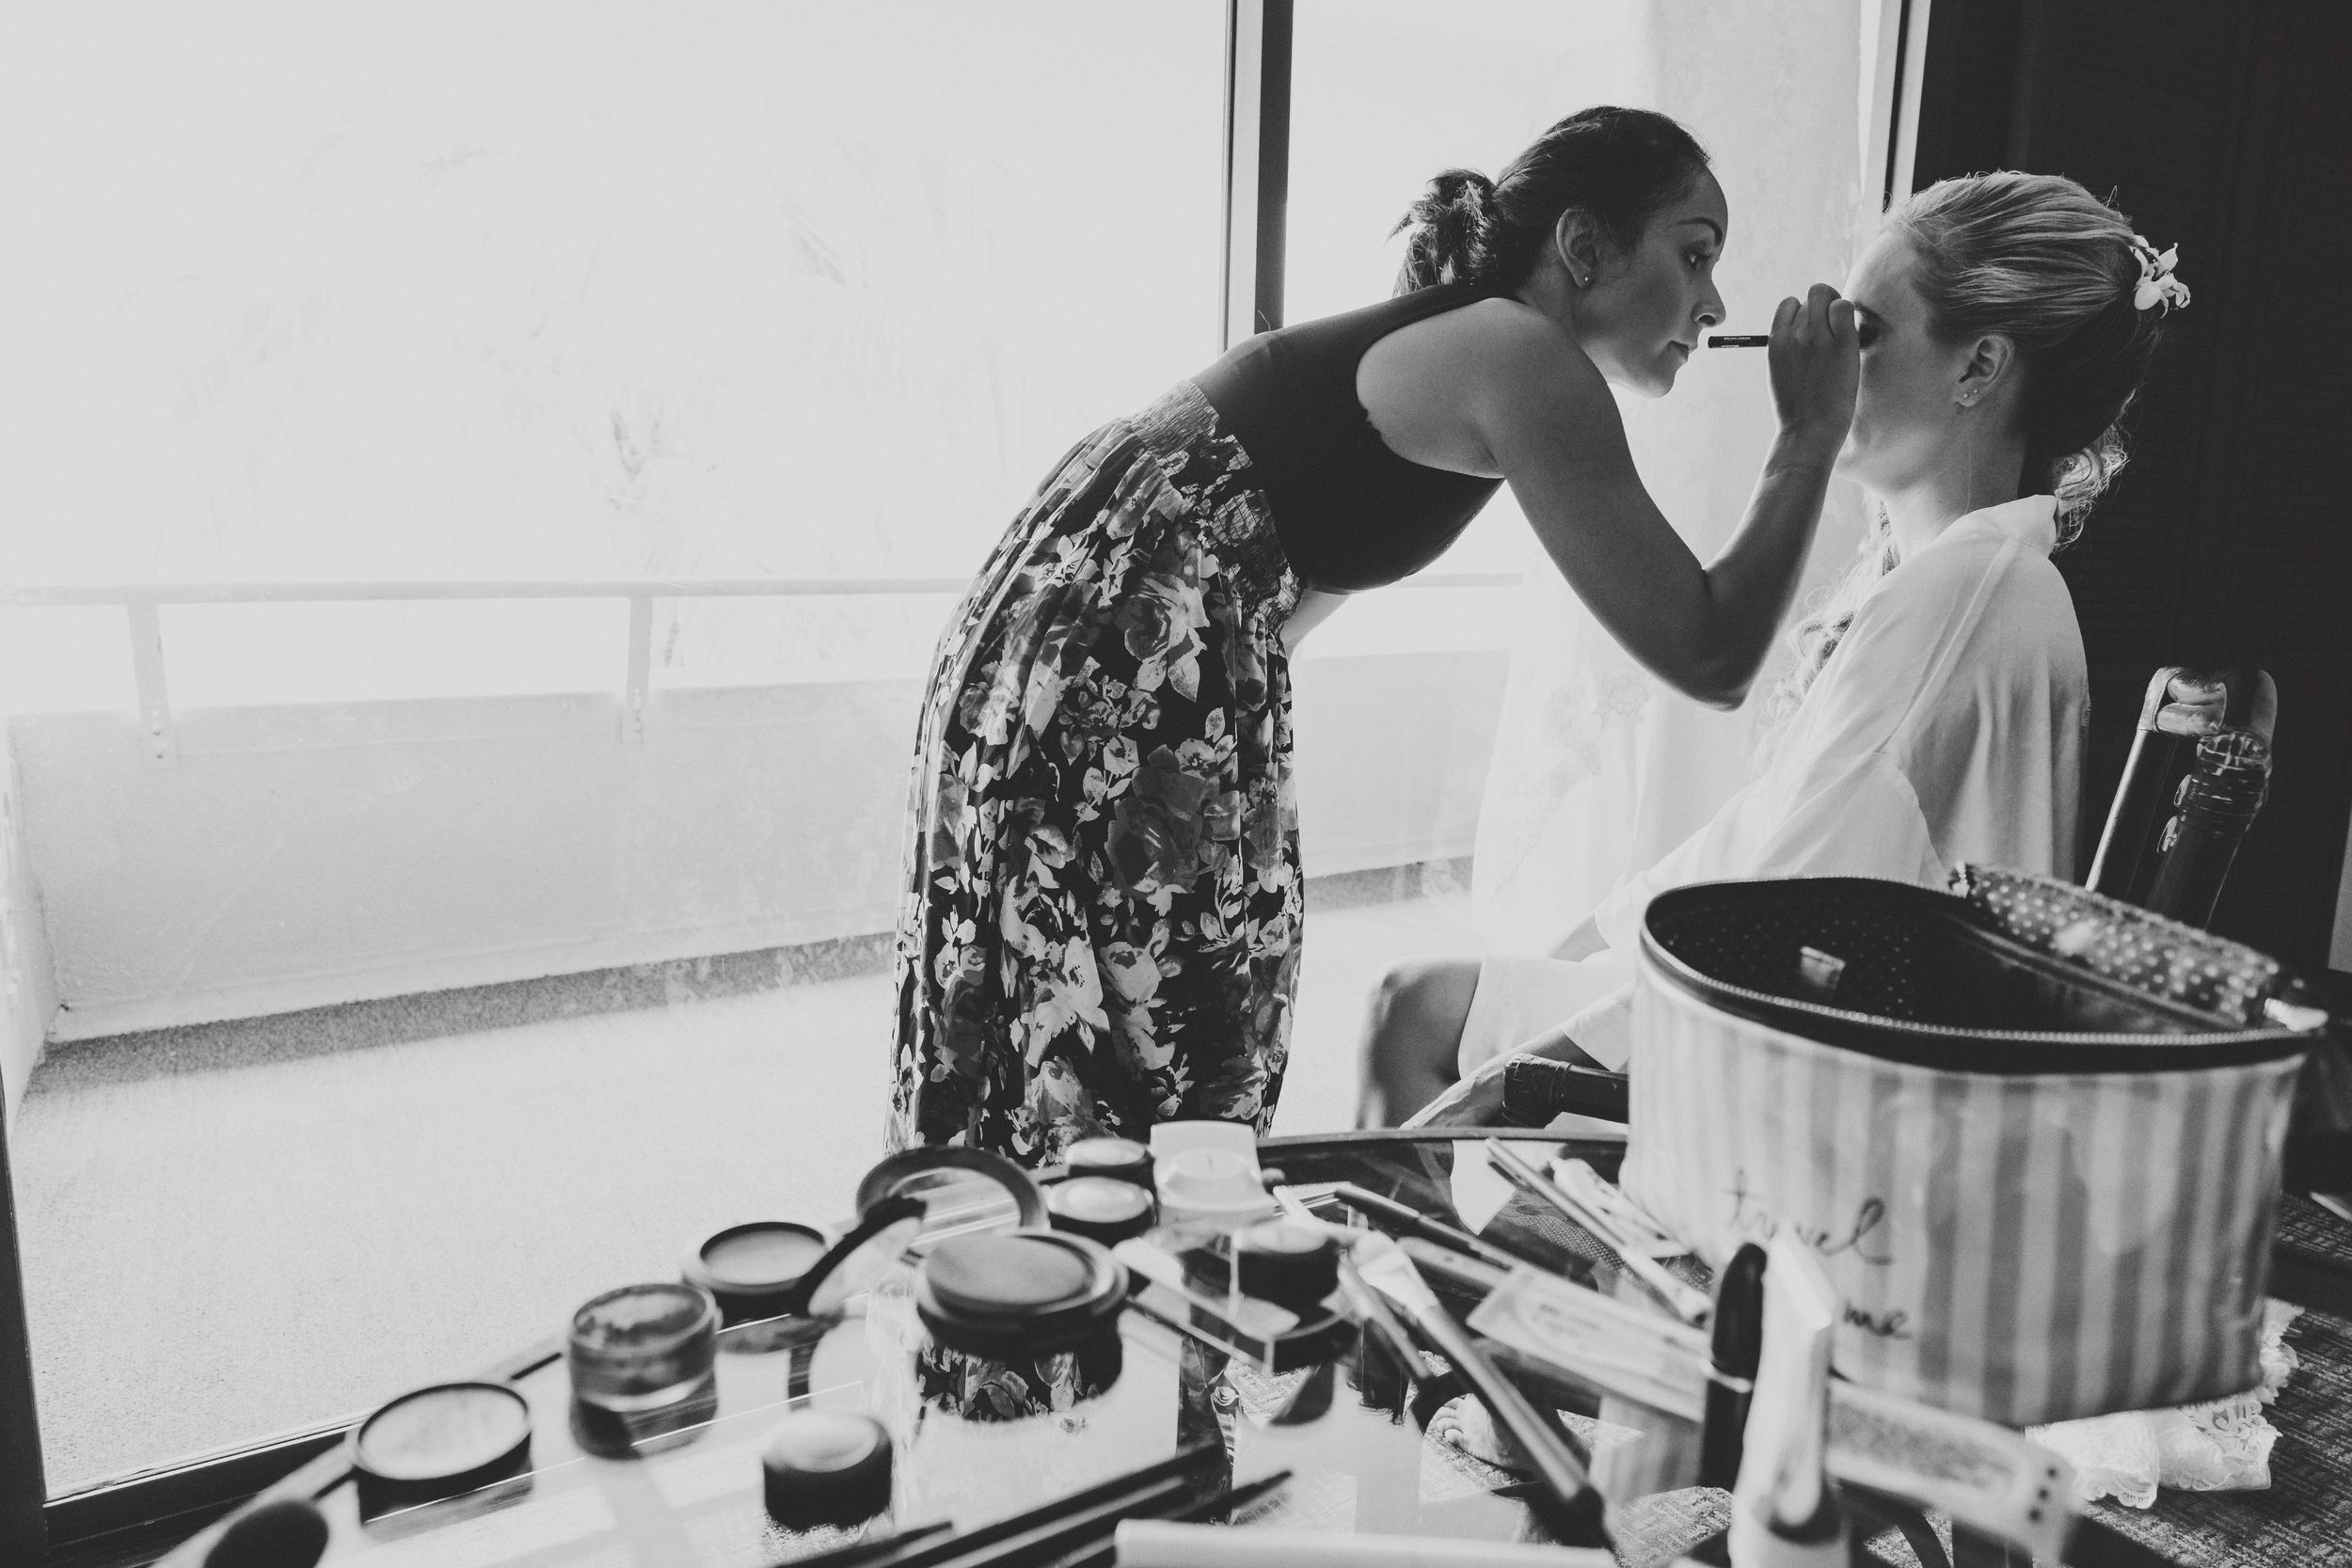 angie-diaz-photography-hawaii-wedding-photographer-kelli-jay-6.jpg